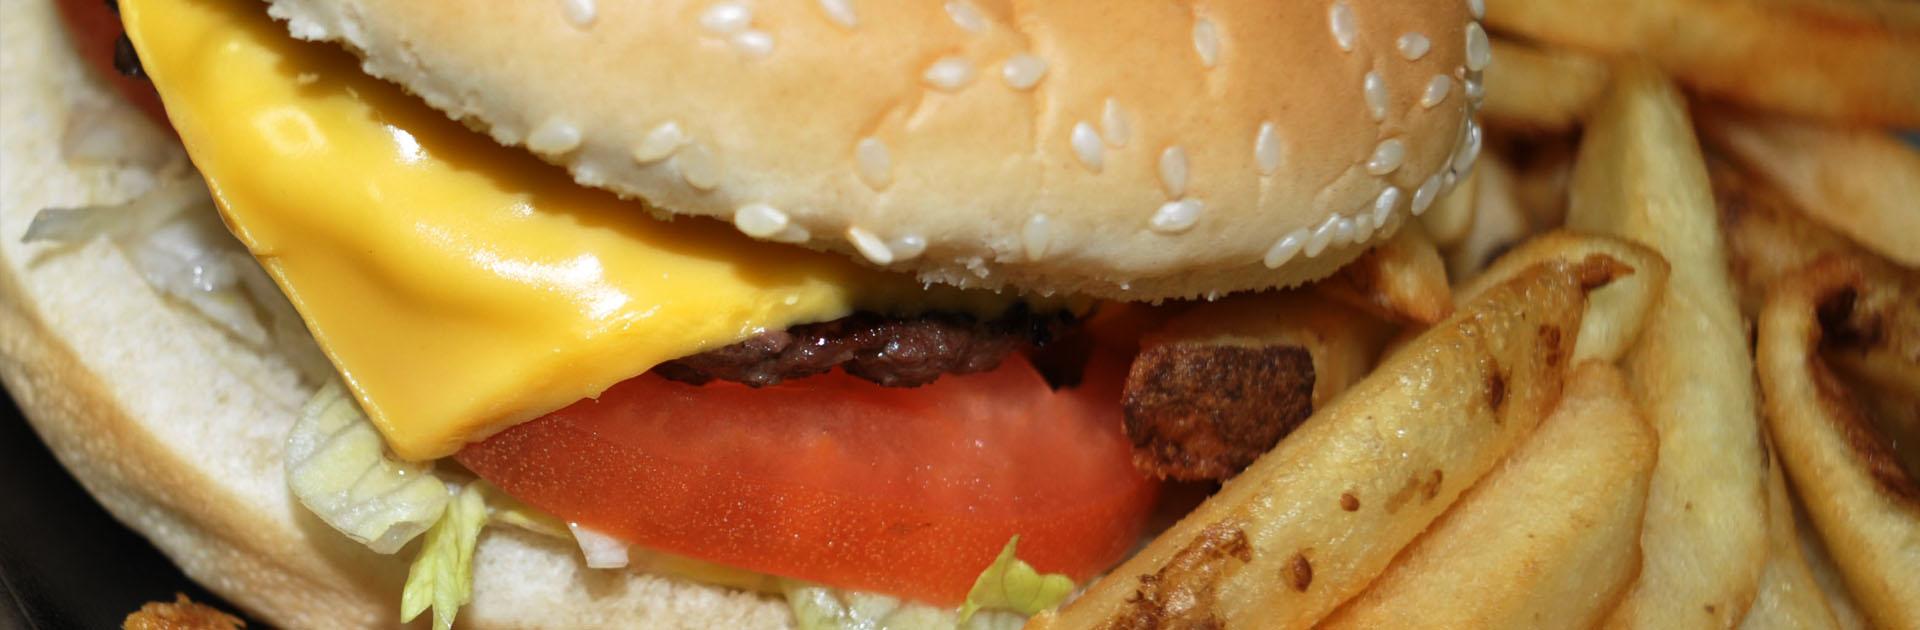 Nishie G's Big Cheeseburger